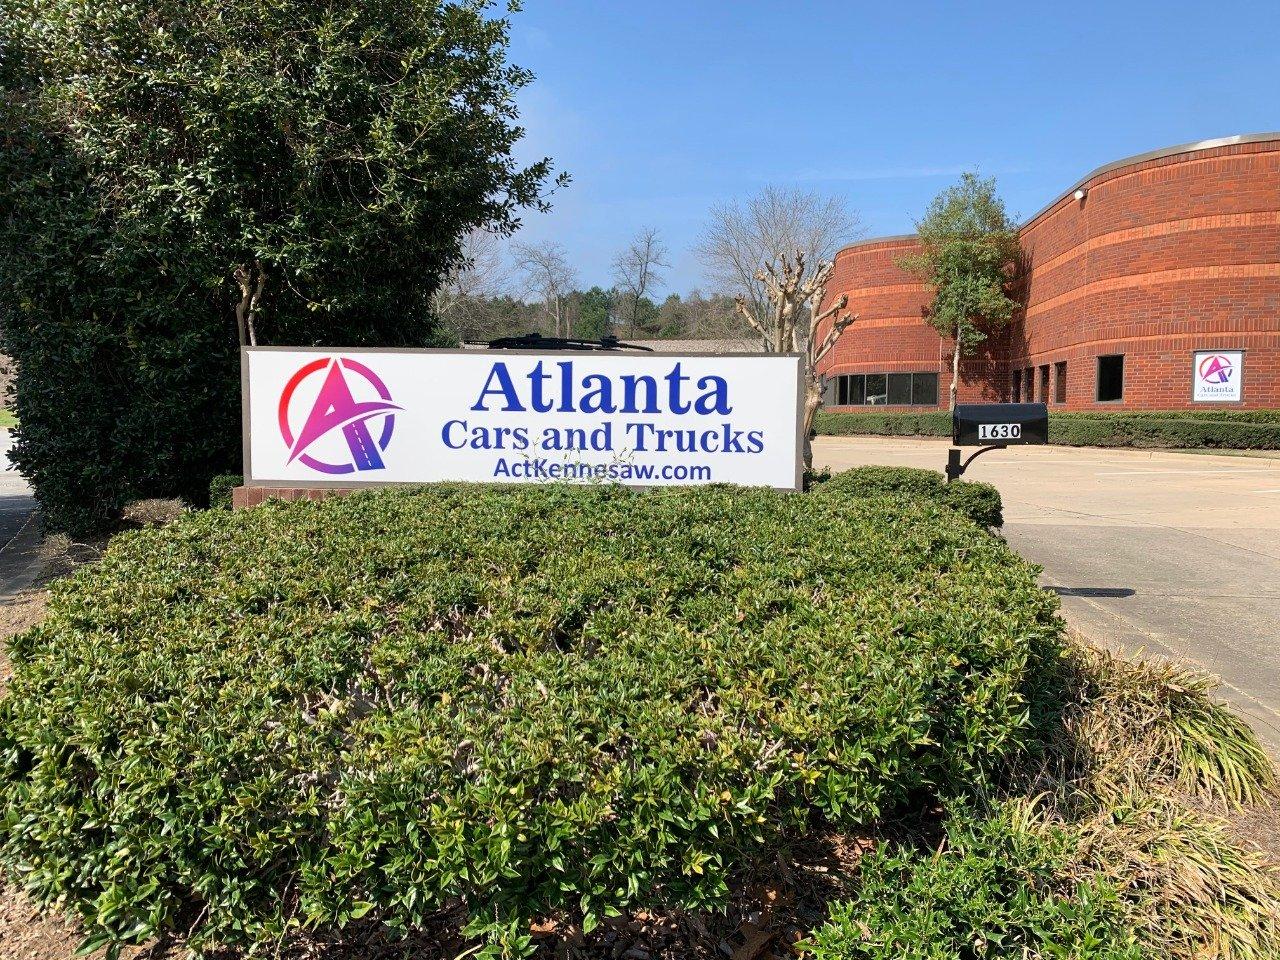 Atlanta Cars and Trucks